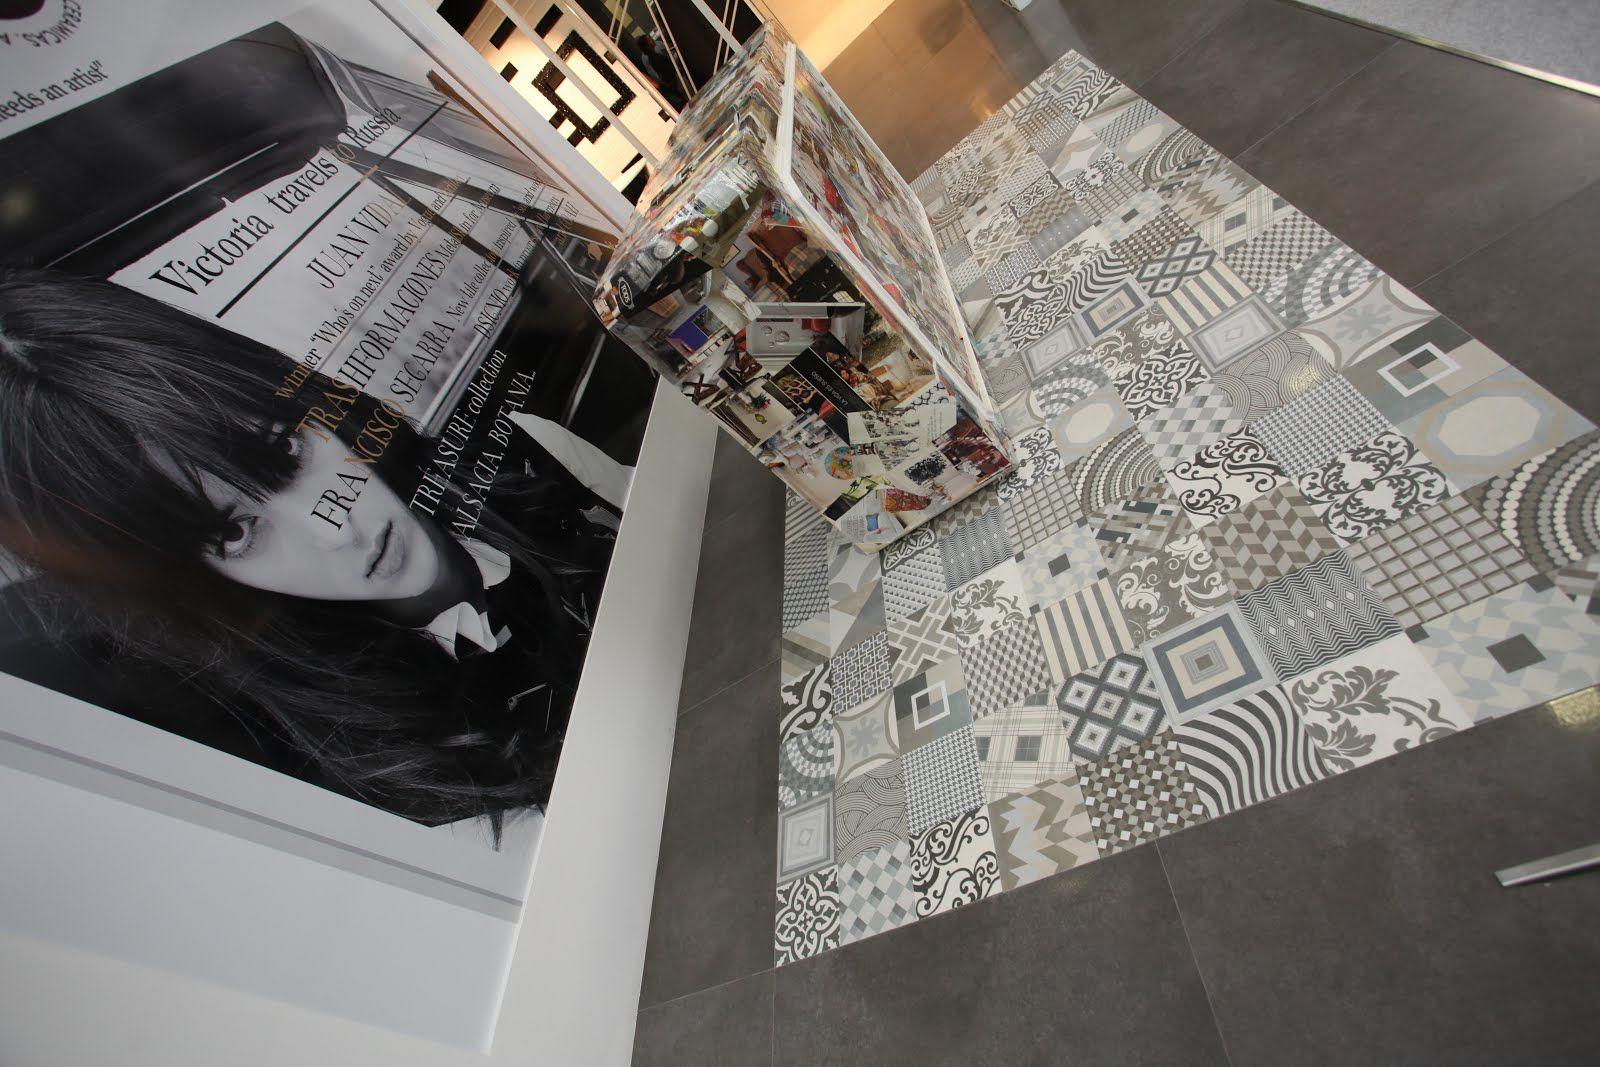 Patterned floor tiles from kalafrana ceramics sydney tile showroom patterned floor tiles from kalafrana ceramics sydney tile showroom http dailygadgetfo Images